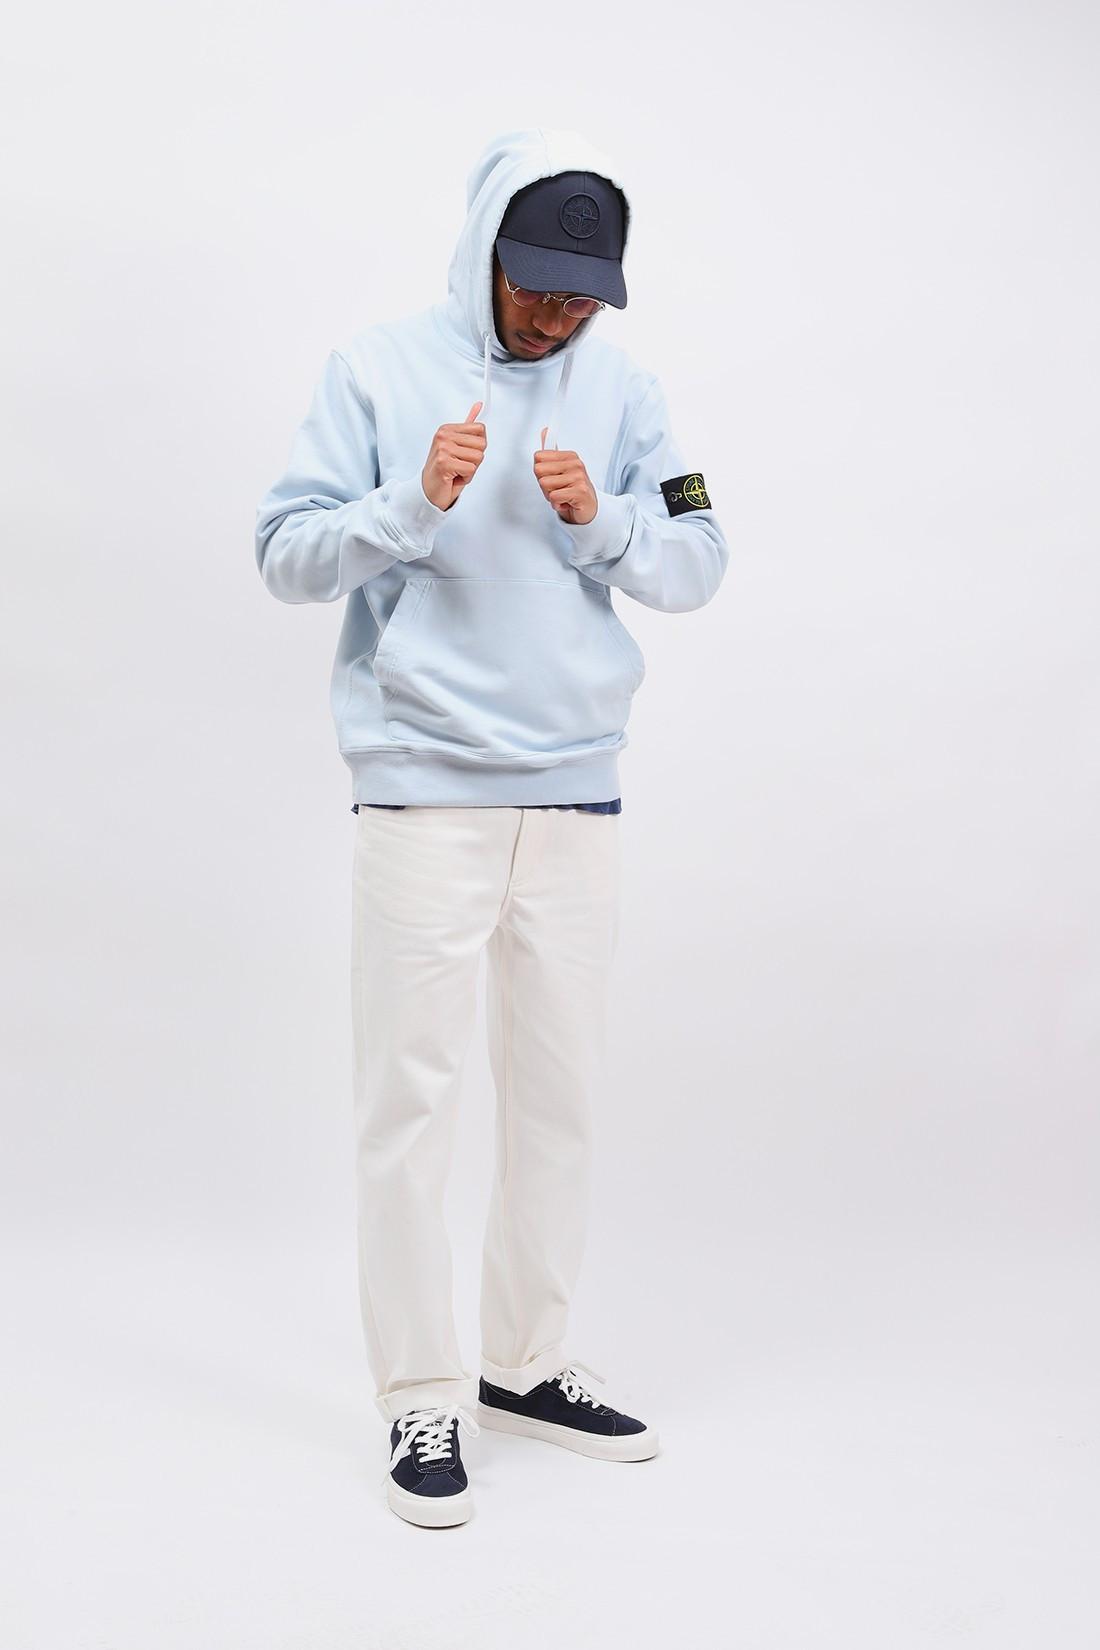 STONE ISLAND / 64151 hooded sweater v0041 Cielo